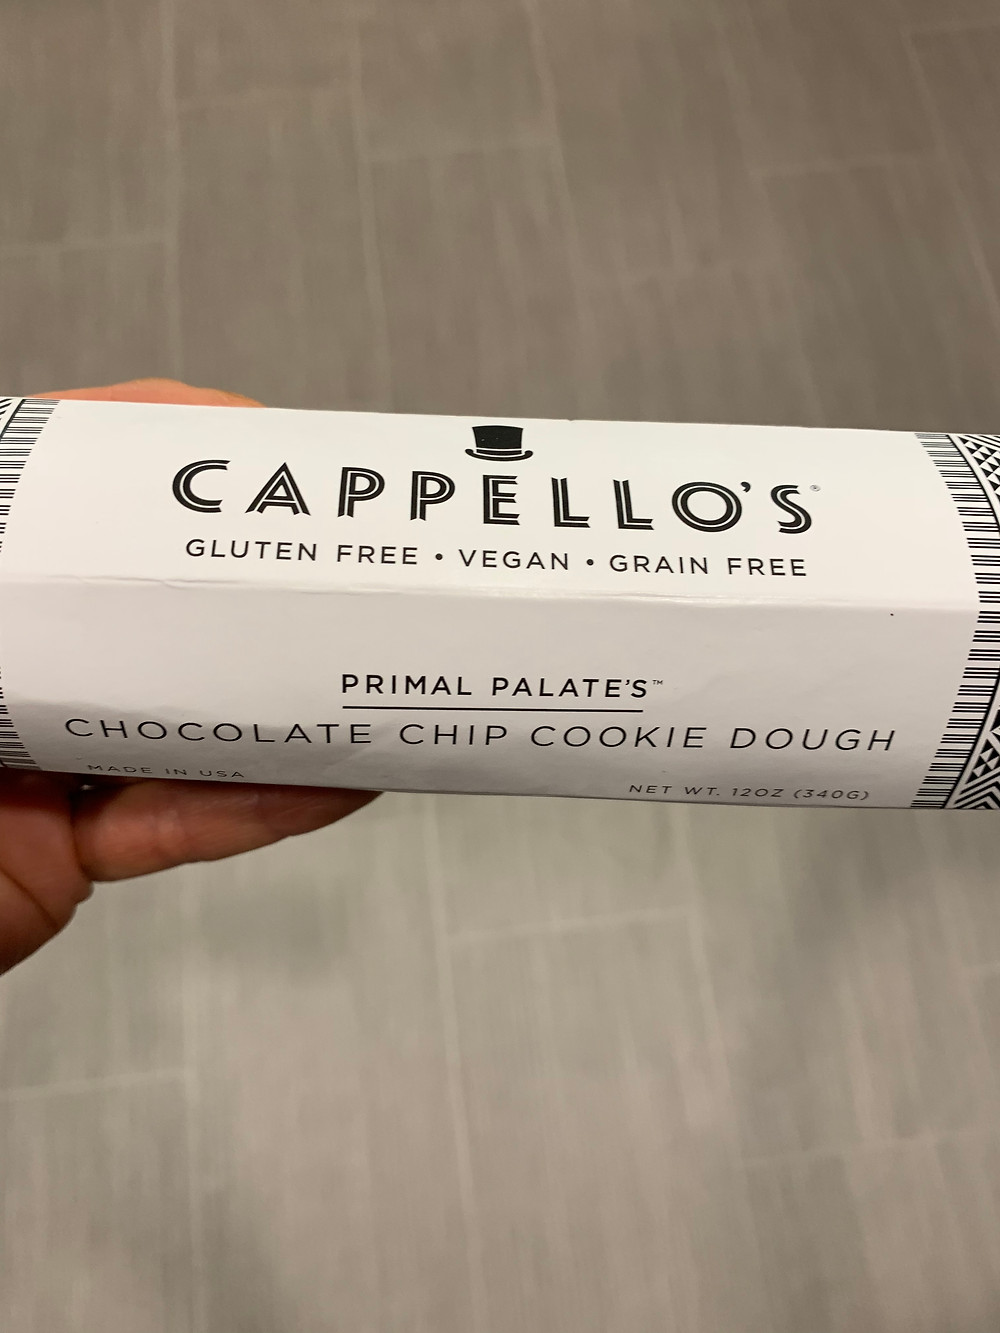 Cappello's cookie dough